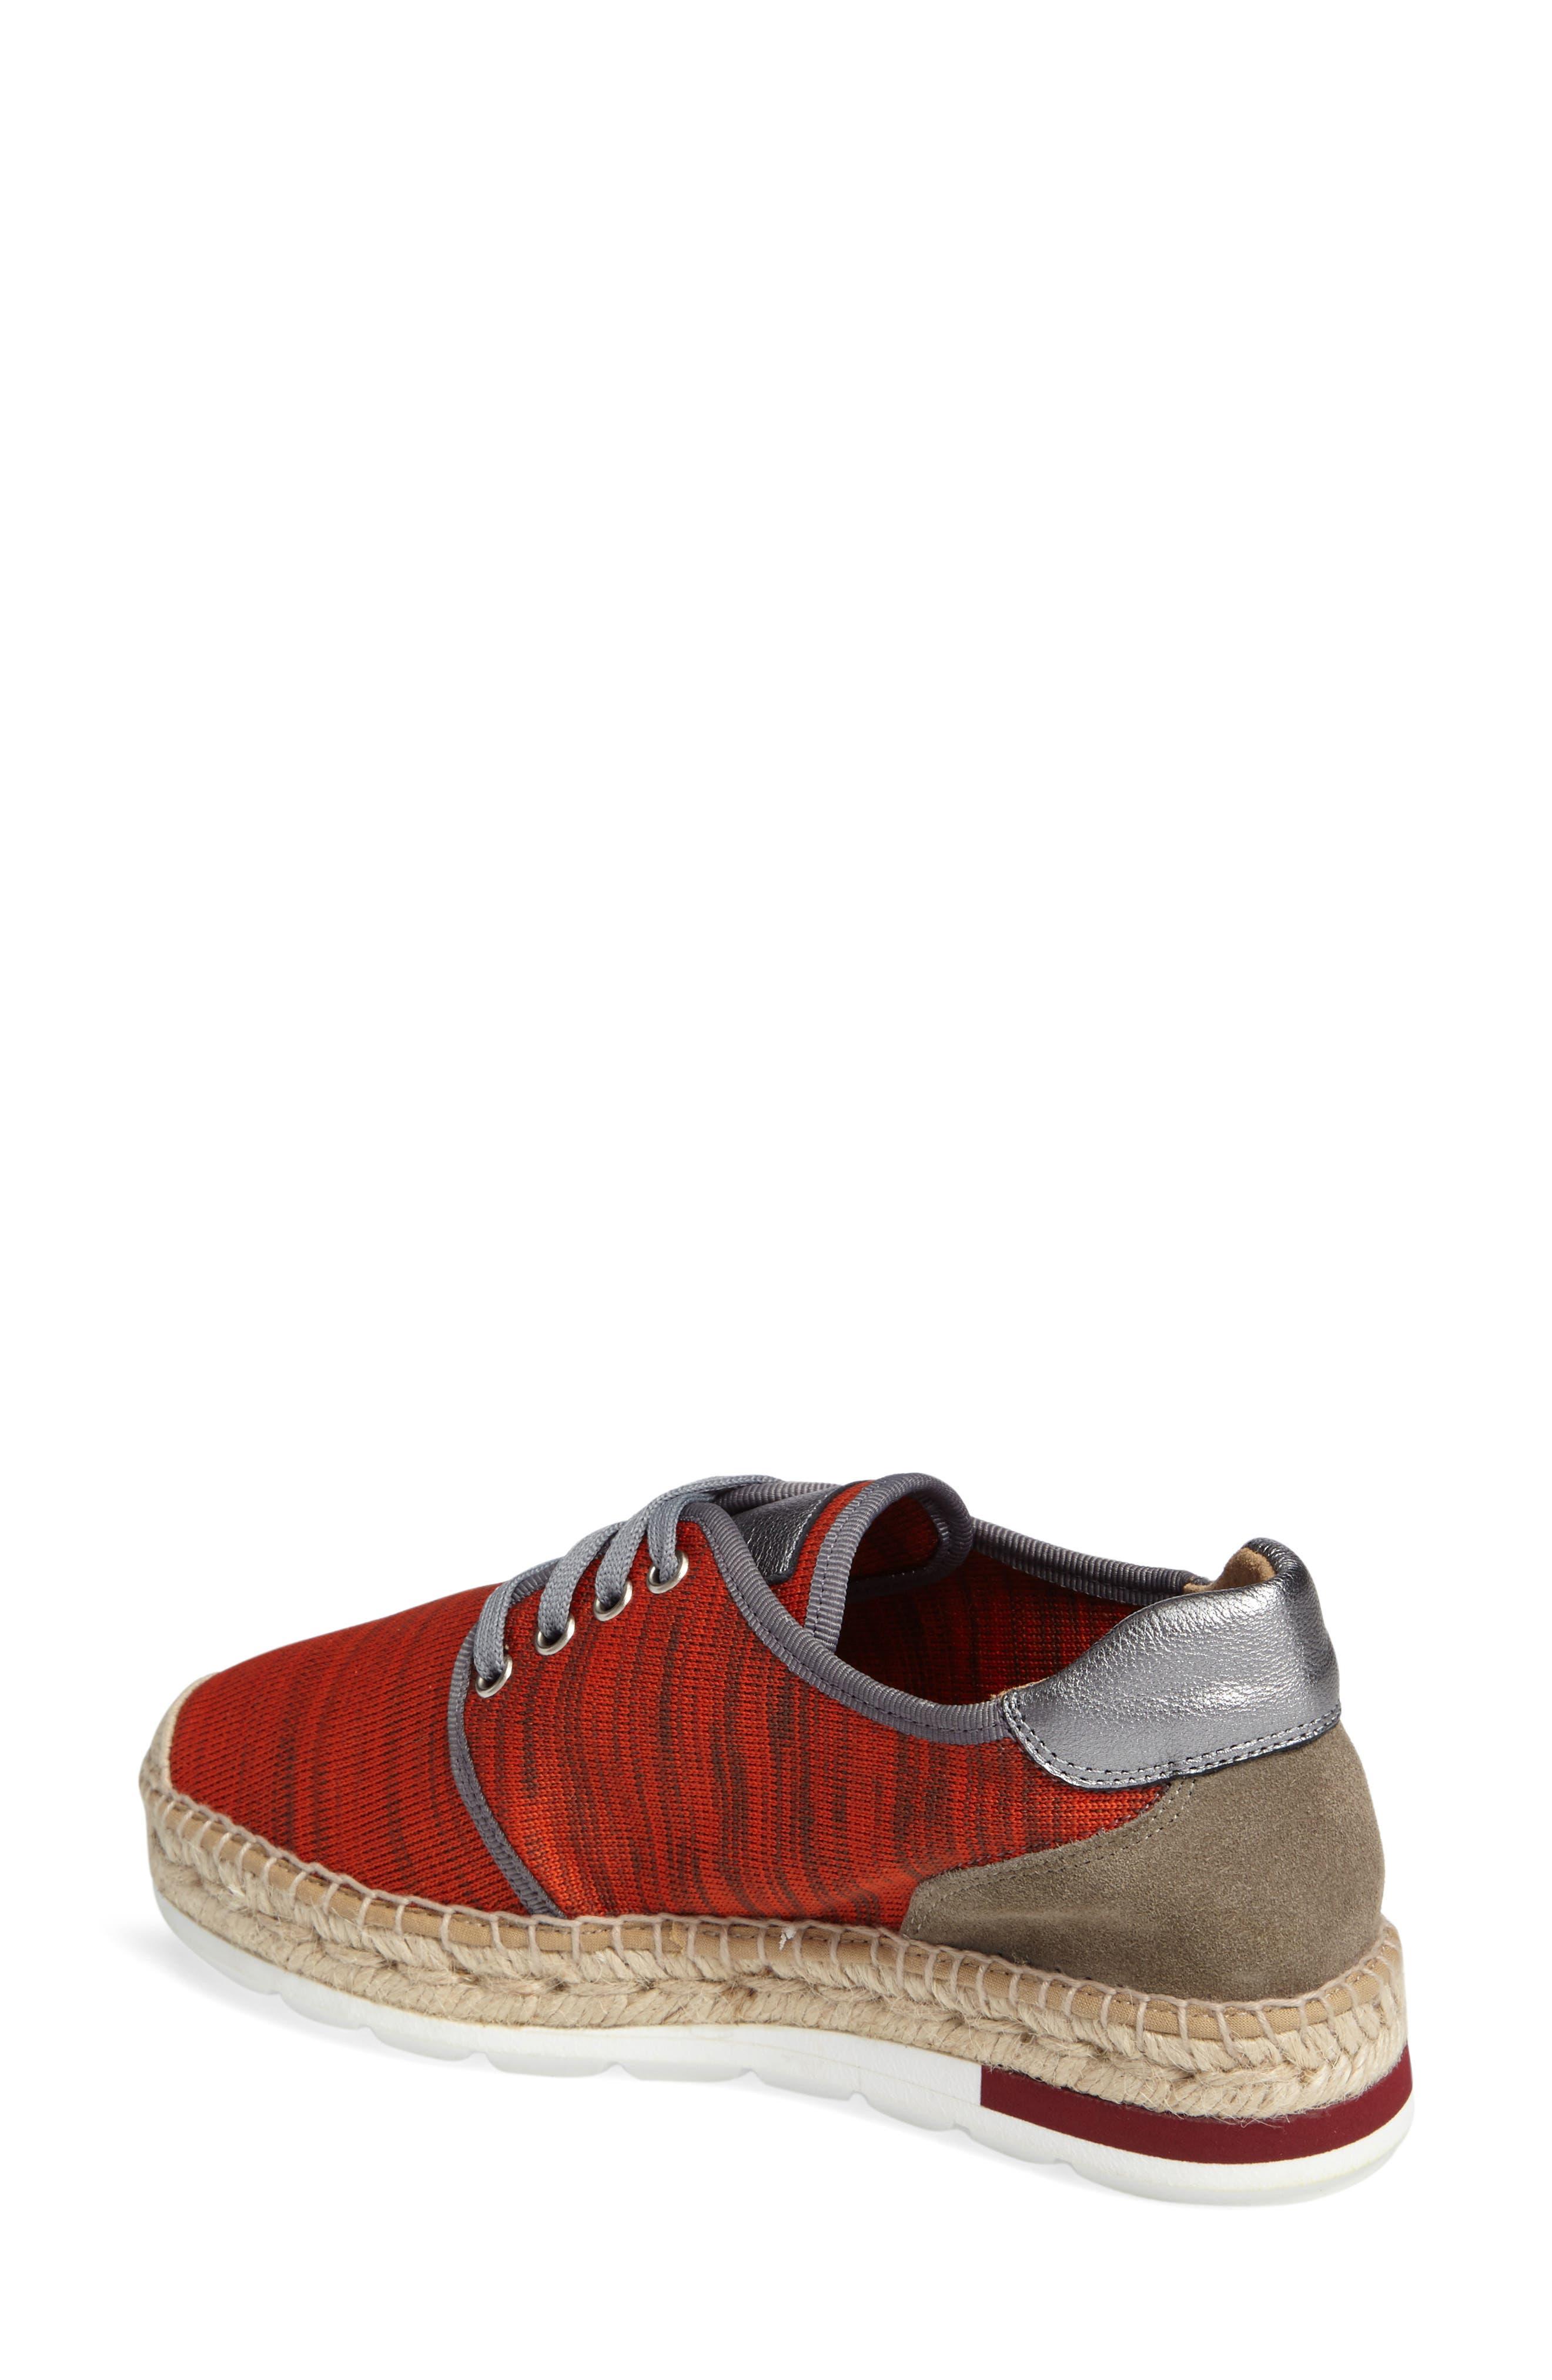 Alternate Image 2  - Bettye Muller Newport Mesh Espadrille Sneaker (Women)